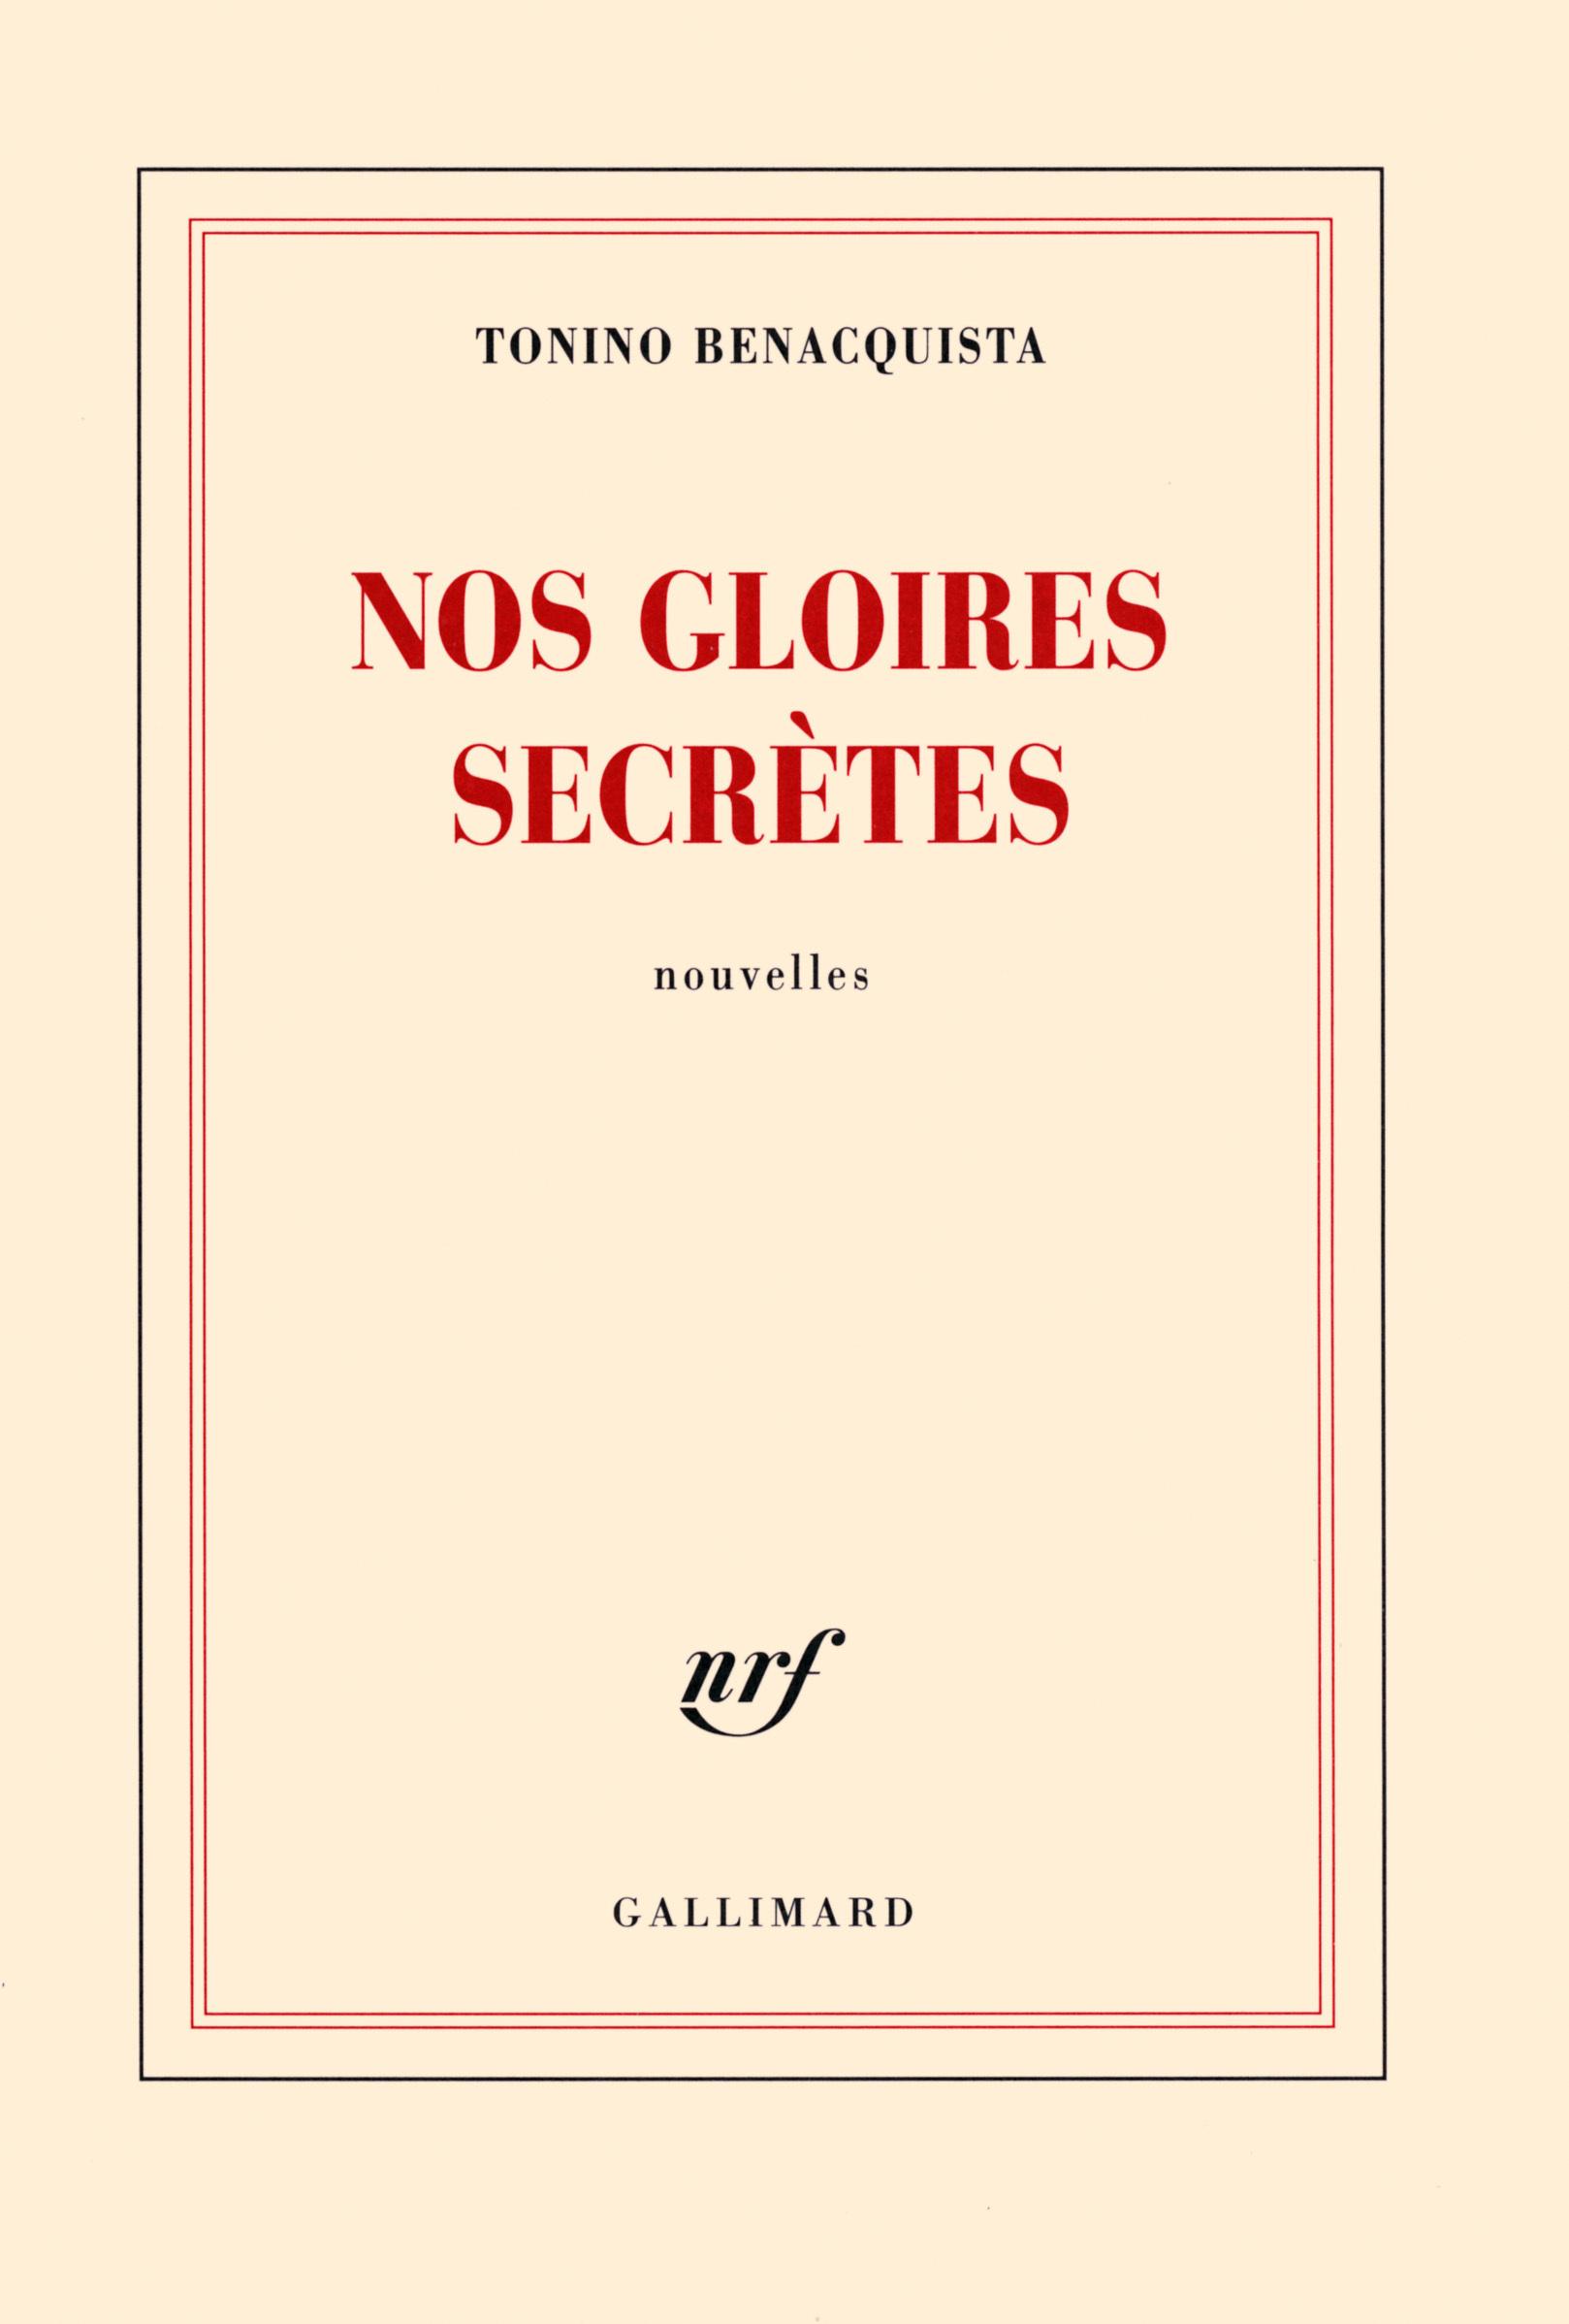 NOS GLOIRES SECRETES